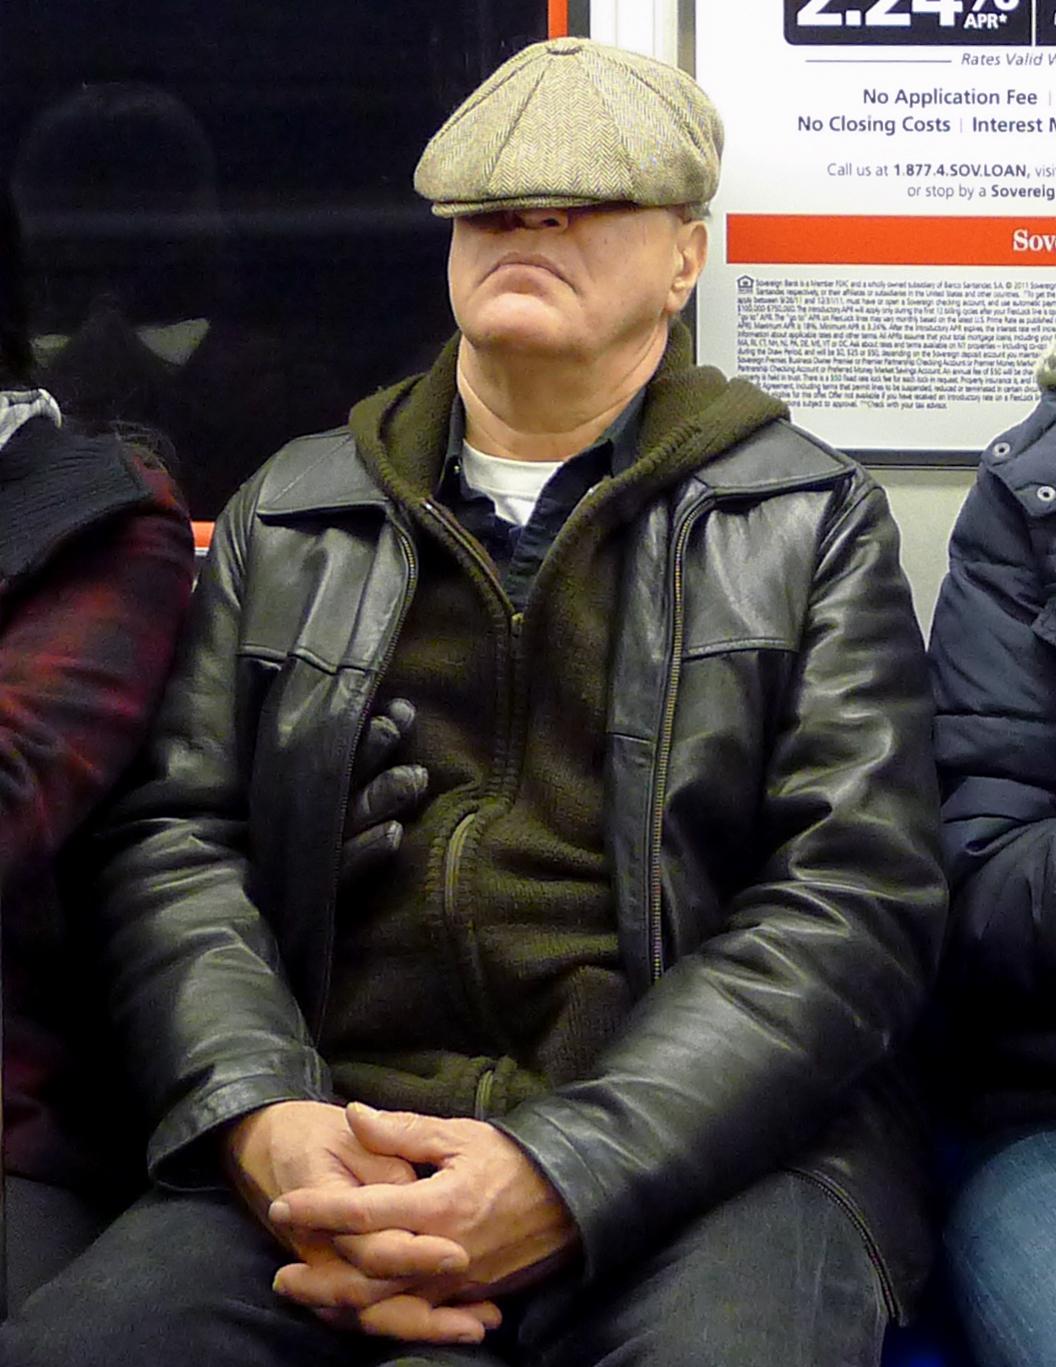 man+with+cap